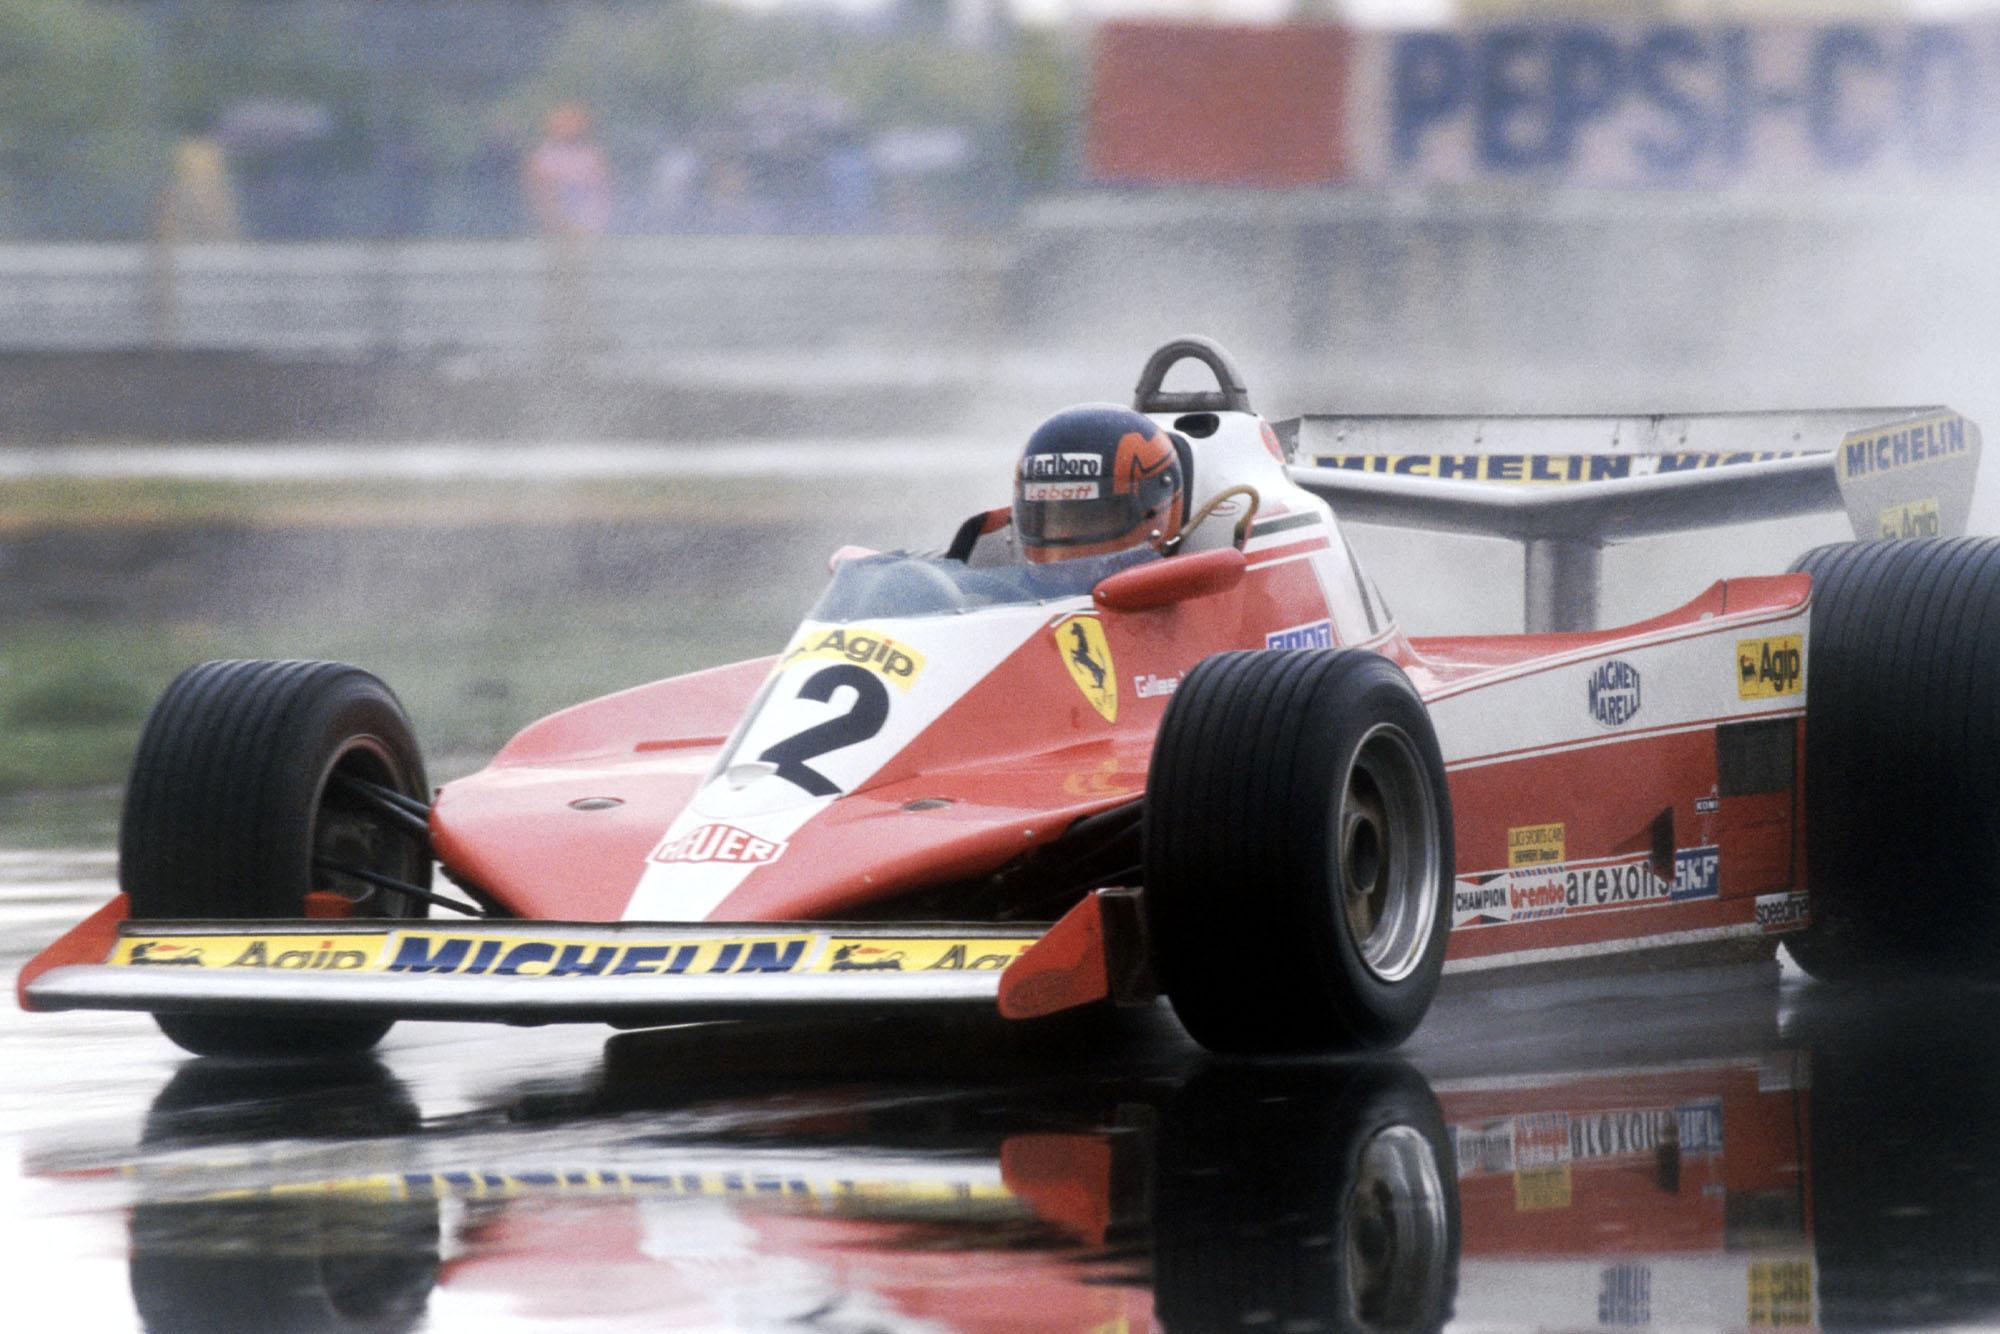 Gilles Villeneuve (Ferrari) at the 1978 Canadian Grand Prix, Montreal.